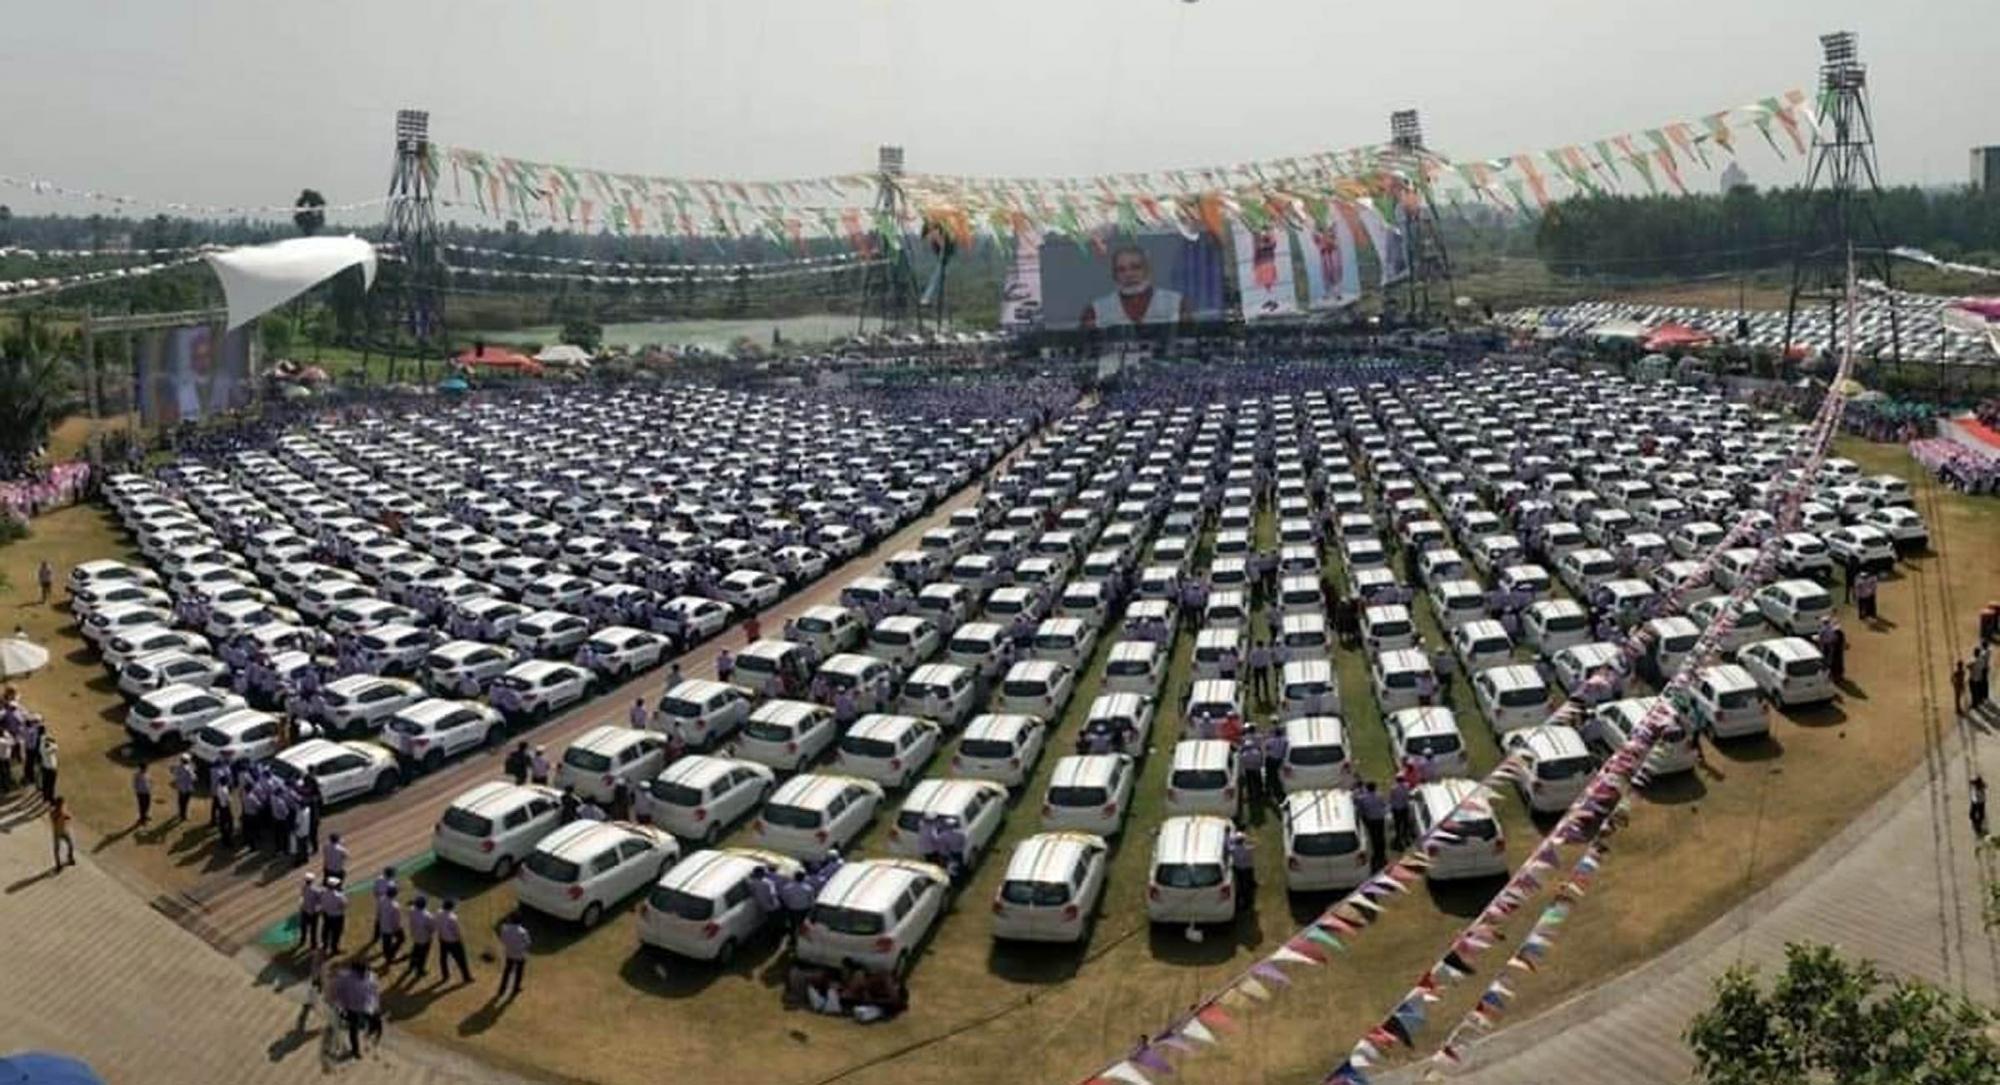 600 cars image